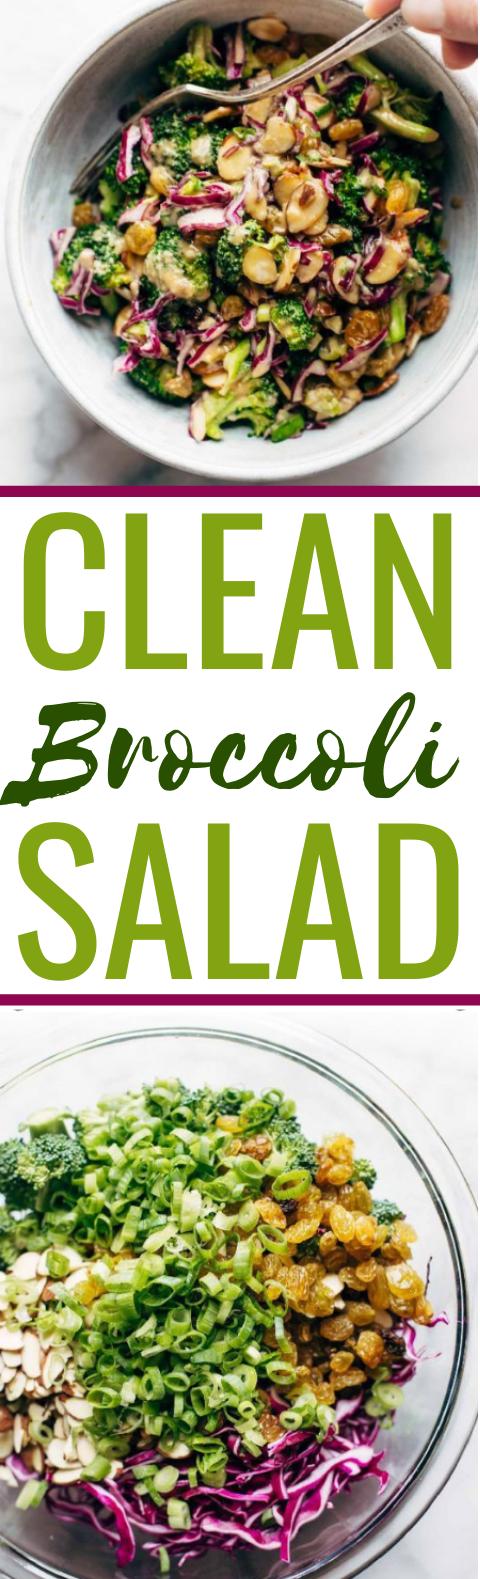 Clean Broccoli Salad with Creamy Almond Dressing #vegan #salad #healthy #glutenfree #sidedish #